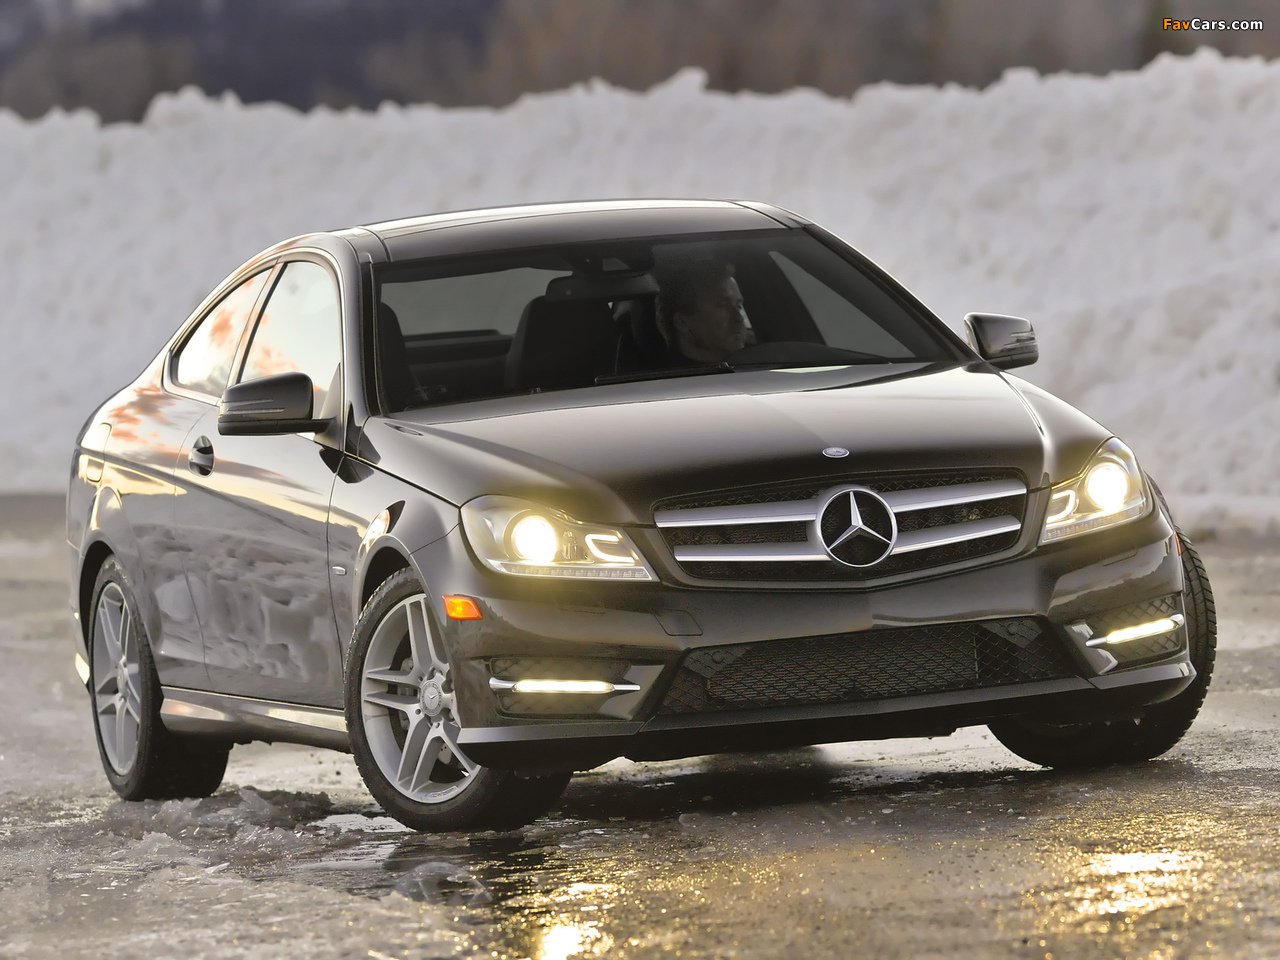 Mercedes-Benz C 350 4MATIC Coupe US-spec (C204) 2011 photos (1280 x 960)